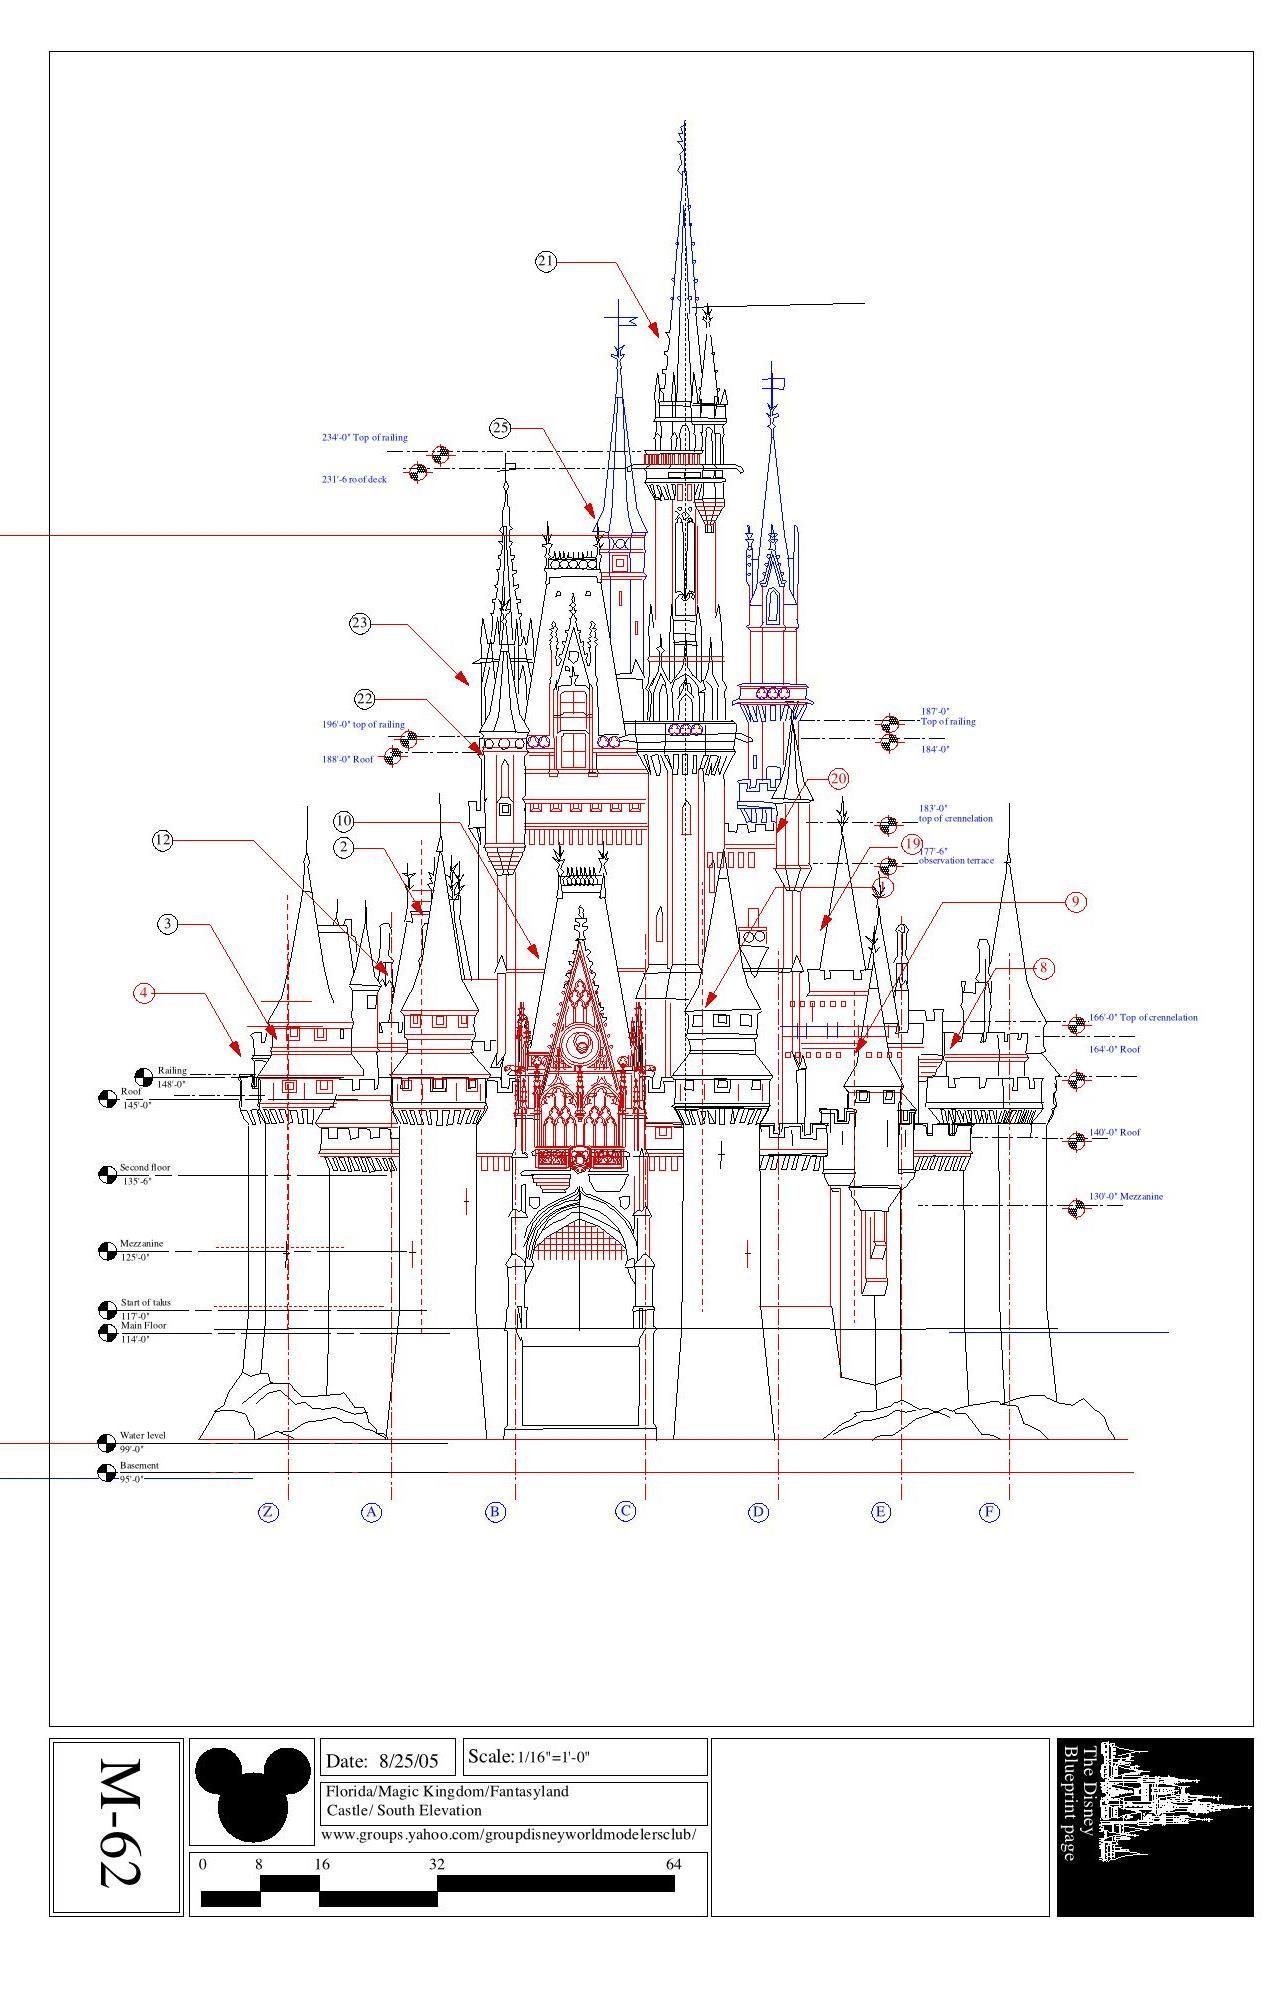 Disney imagineering blueprints for cinderella 39 s castle for Florida blueprint